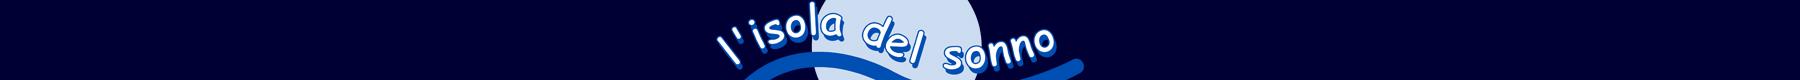 Header-isola-del-sonno-logo